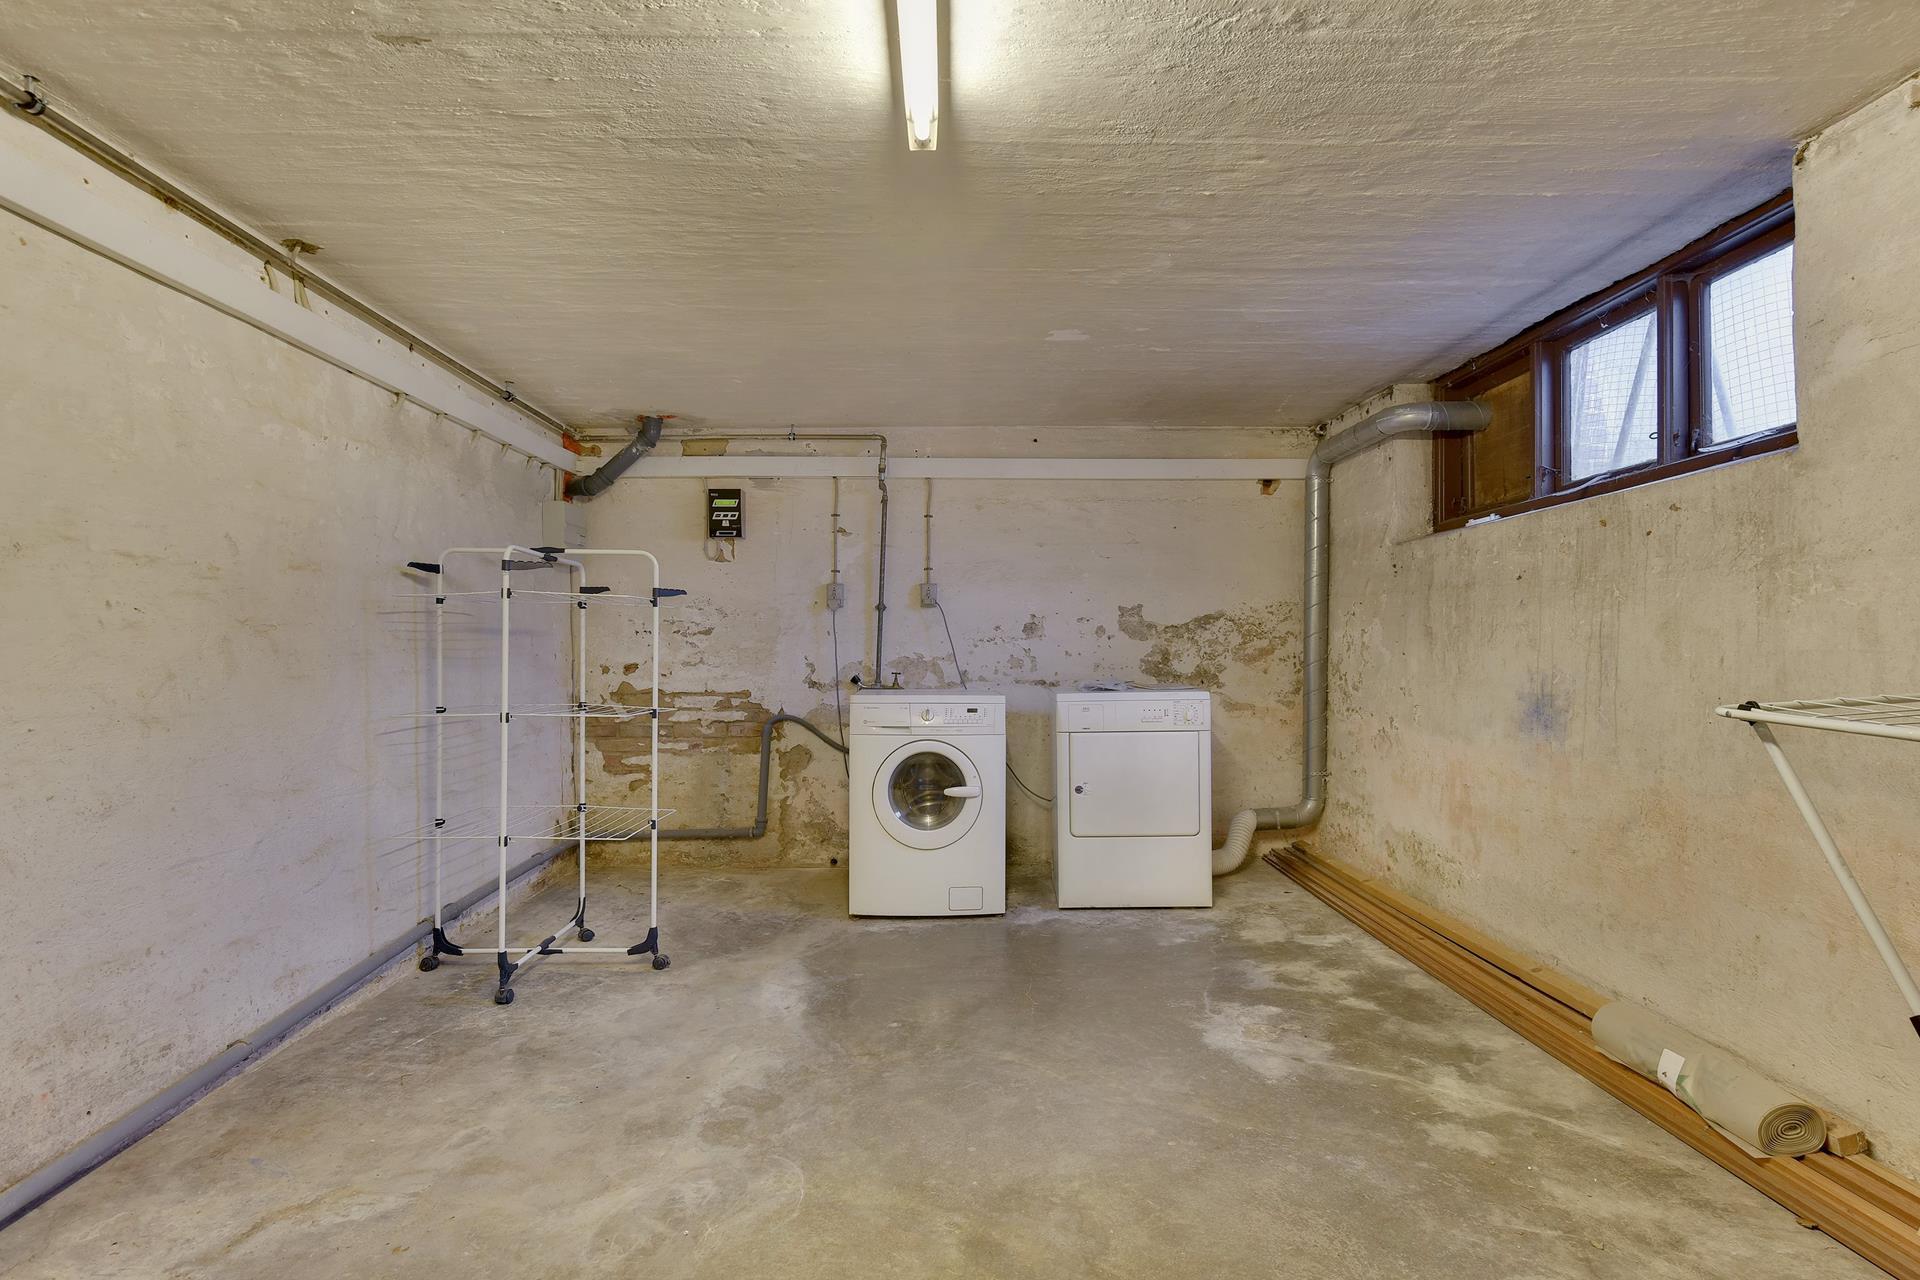 Boligudlejning på Prangervej i Fredericia - Bryggers